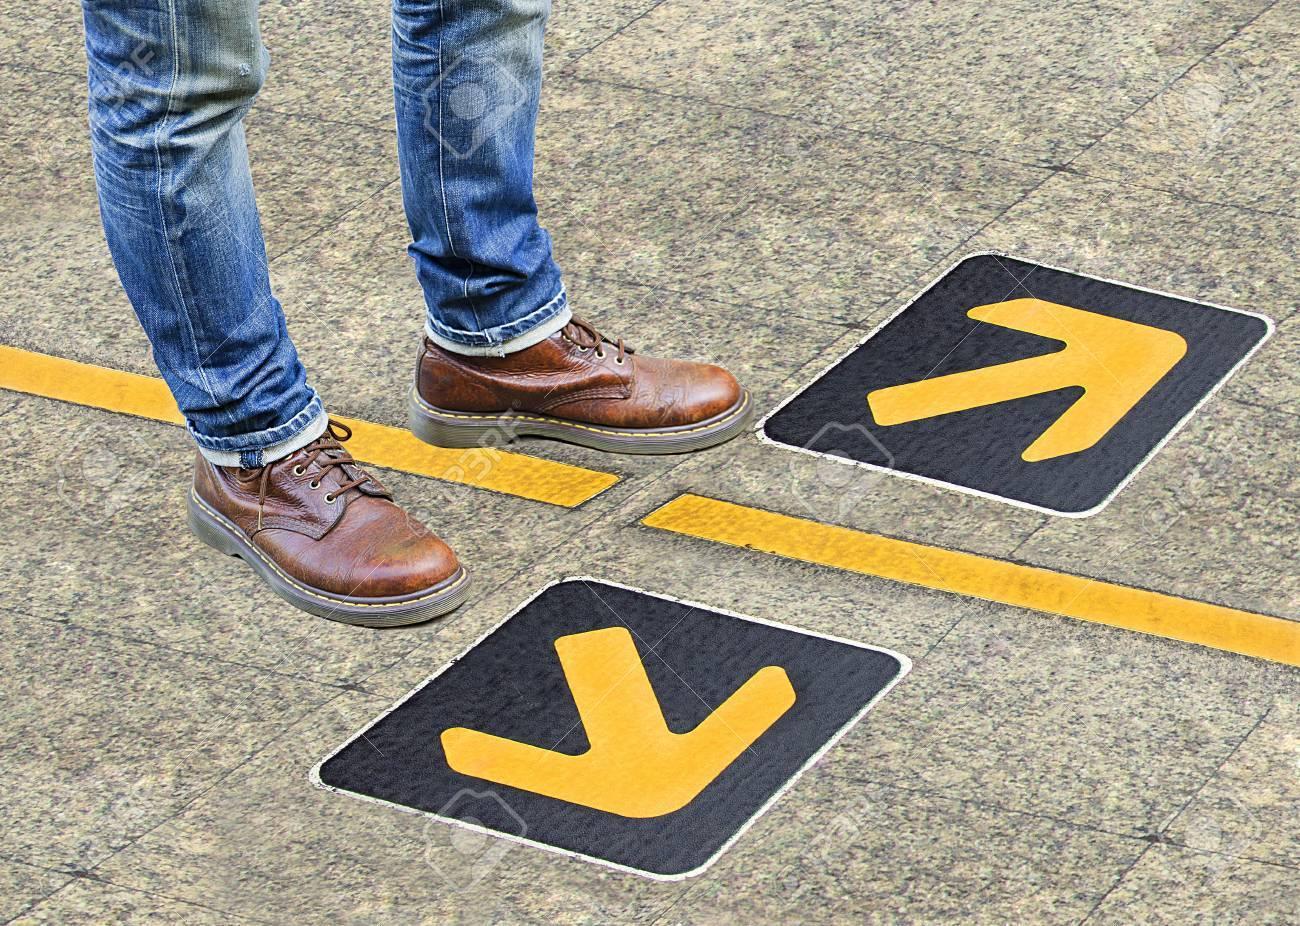 confusion , direction , arrow - 34108250